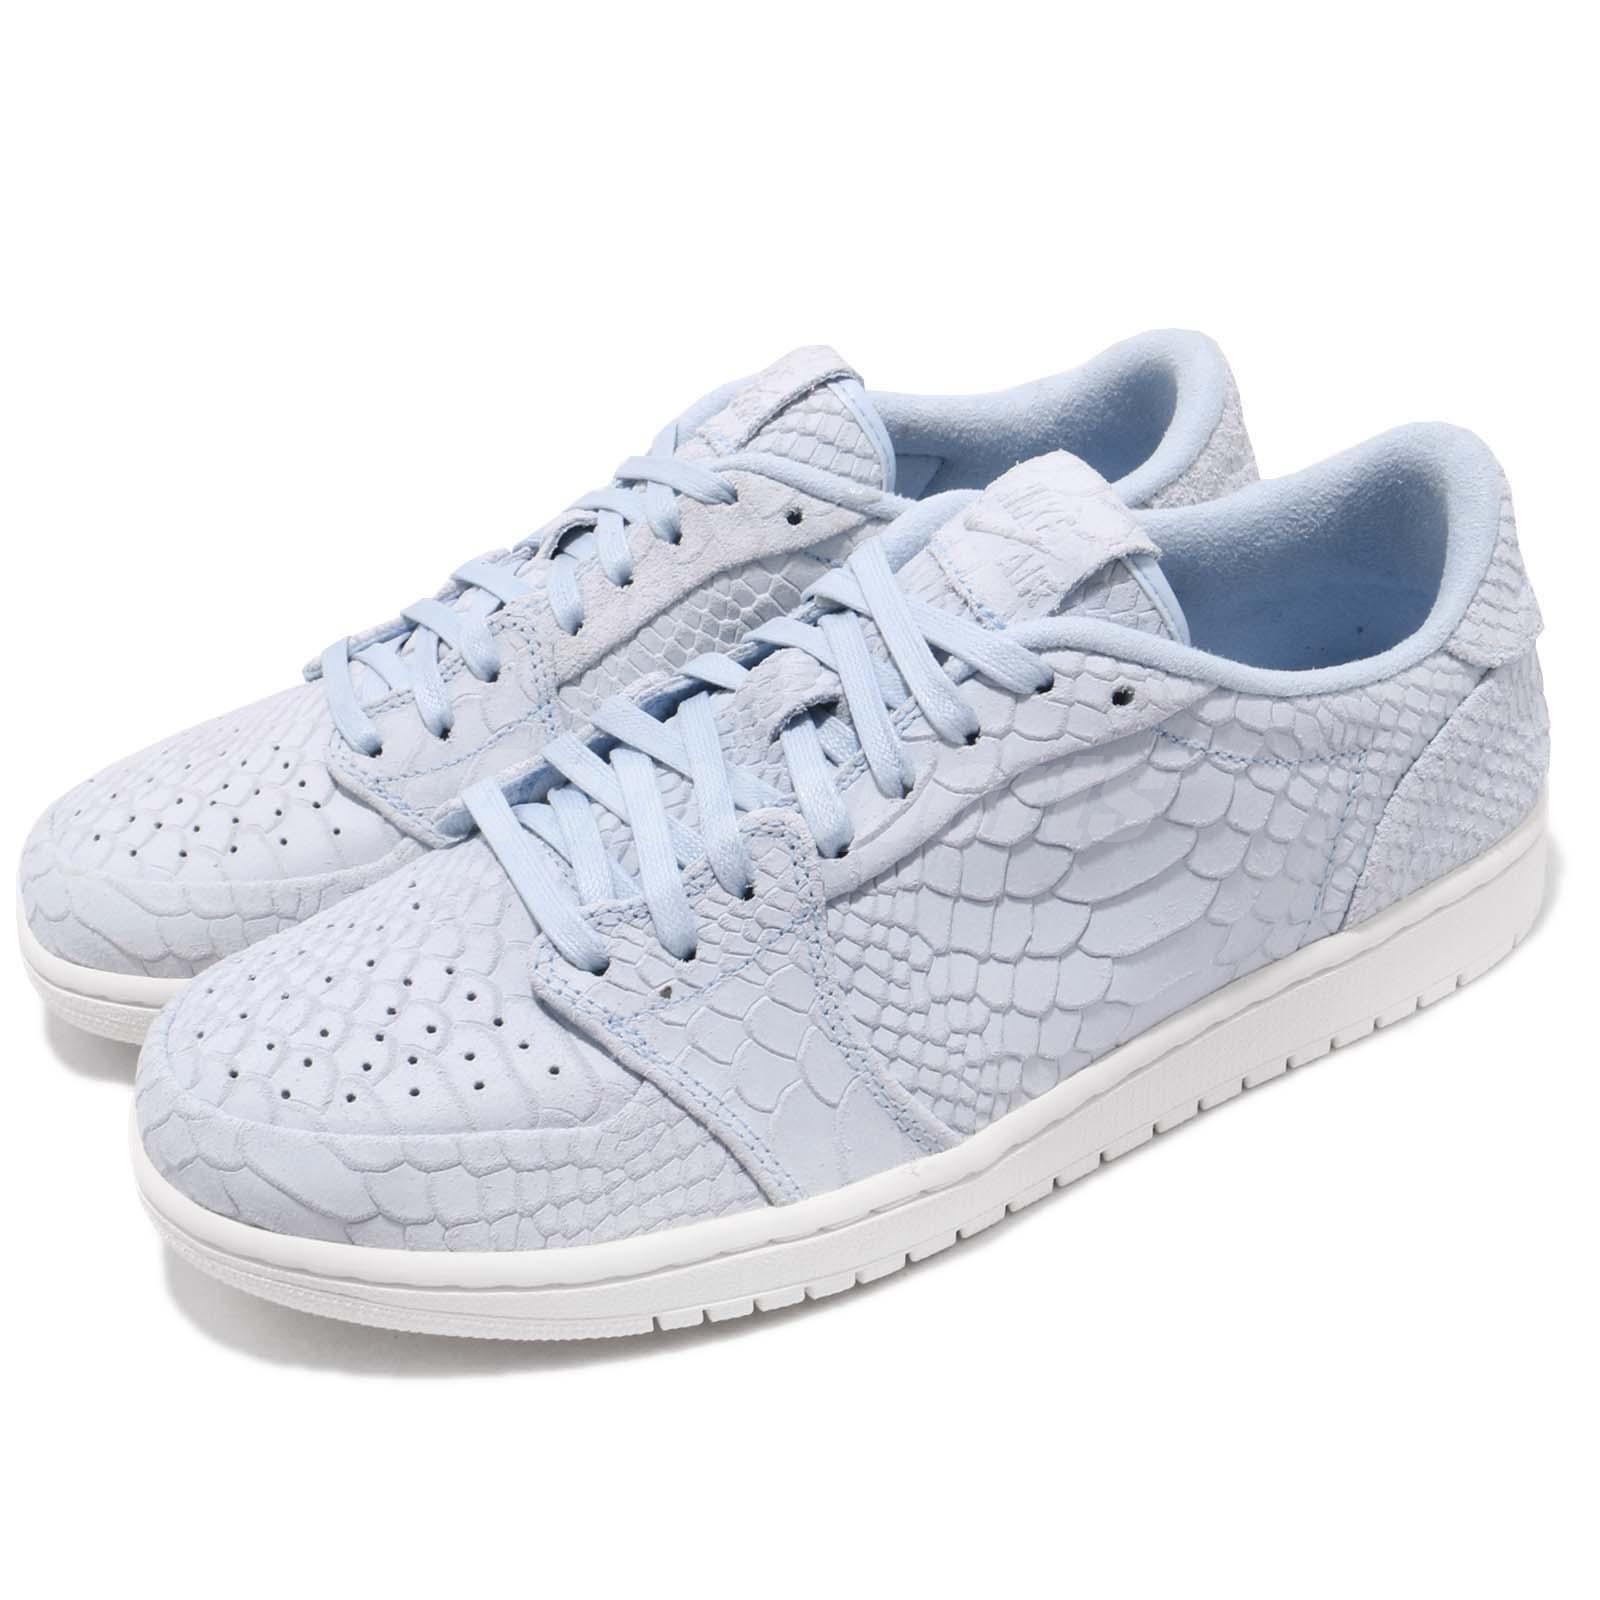 bd35dd8f23a Details about Nike Air Jordan 1 Retro Low NS No Swoosh Ice Blue Sail Men  Shoes 872782-441